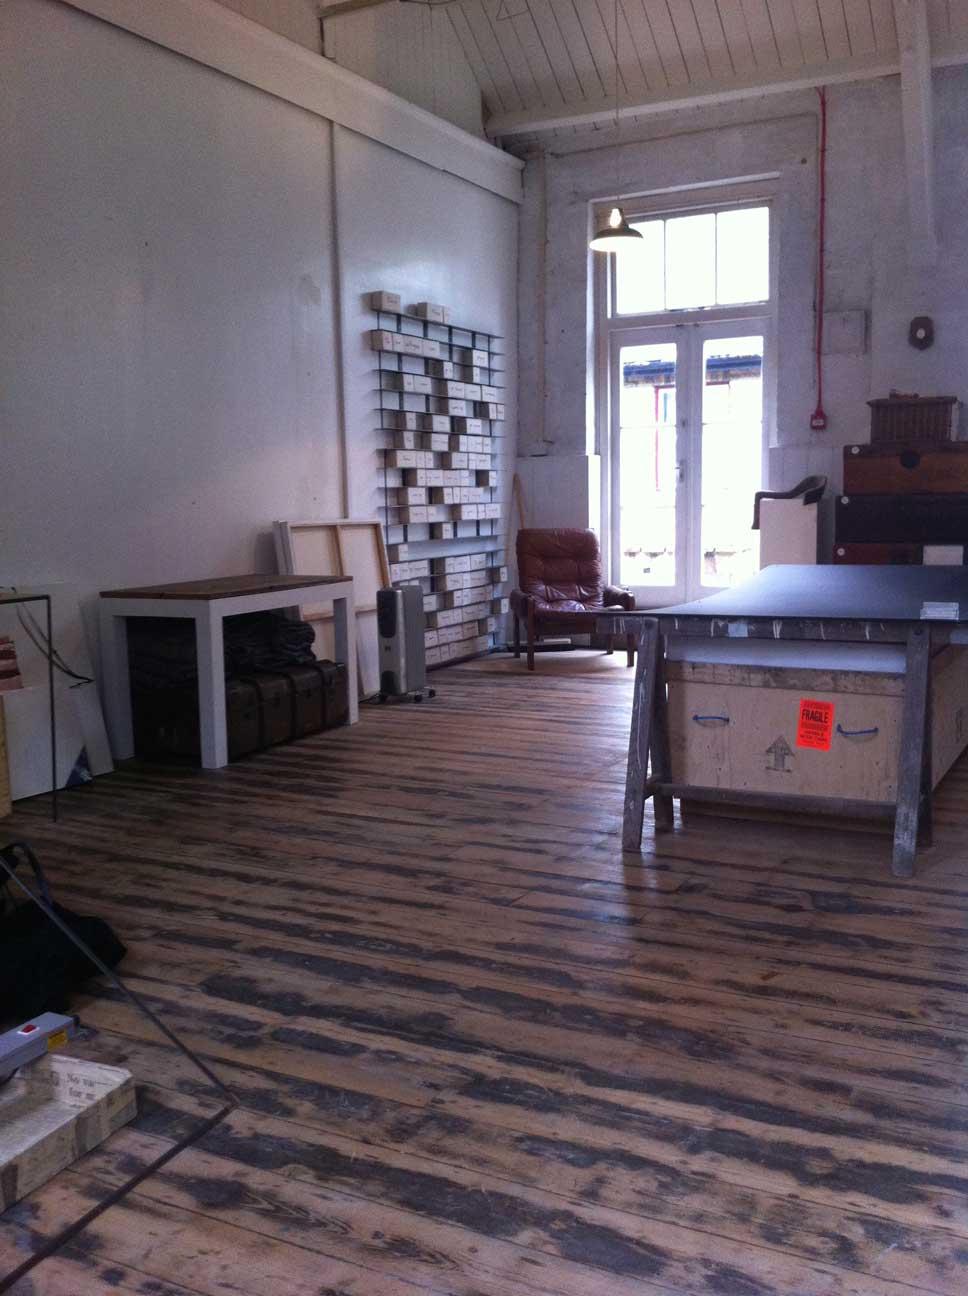 Interior of Adeline de Monseignat's studio. Picture: Bel Jacobs.